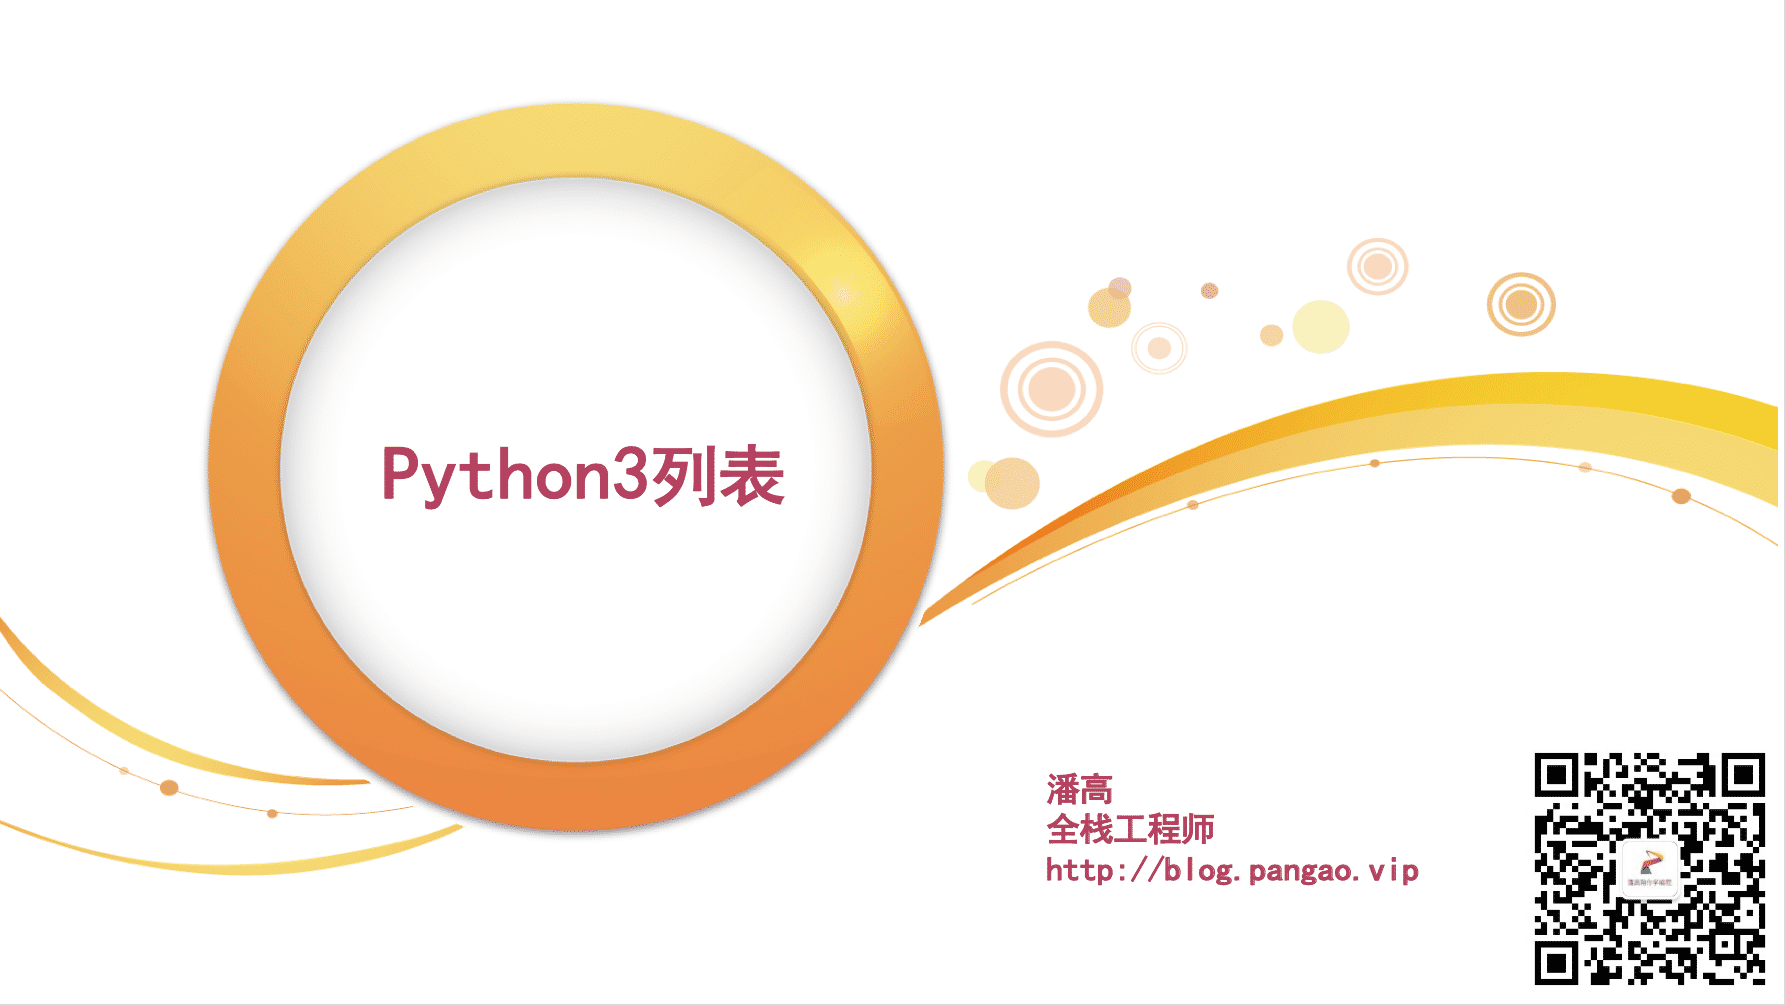 Python3列表-Python入门到精通